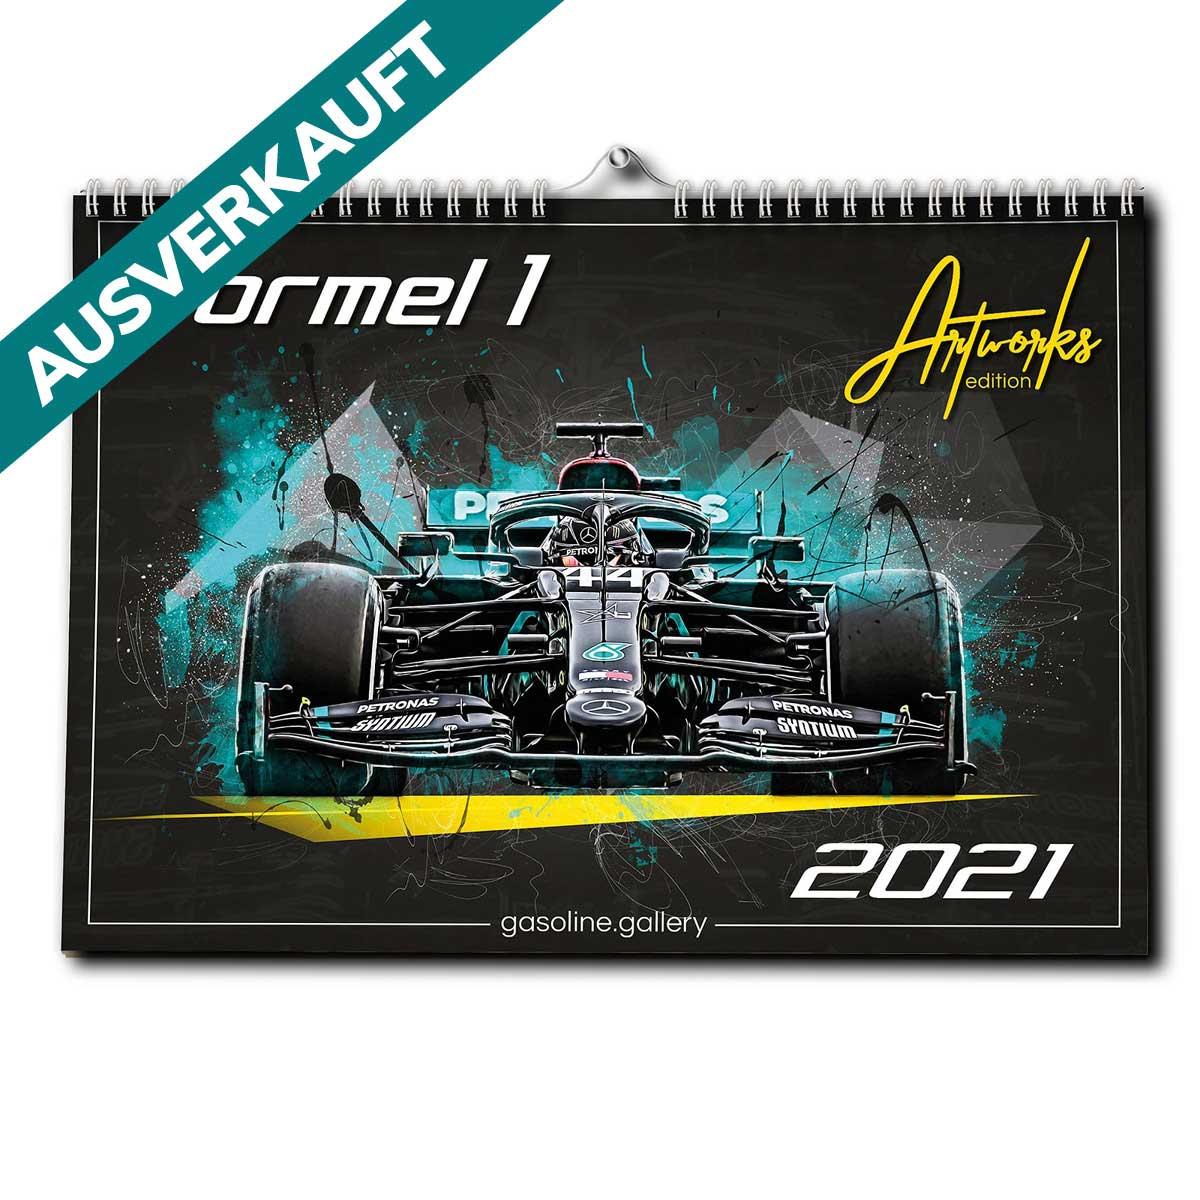 Formula 1 Calendar 2021 Dina2 Premium Wall Calendar Artwork Edition 12 Months Wall Calender Gasoline Gallery